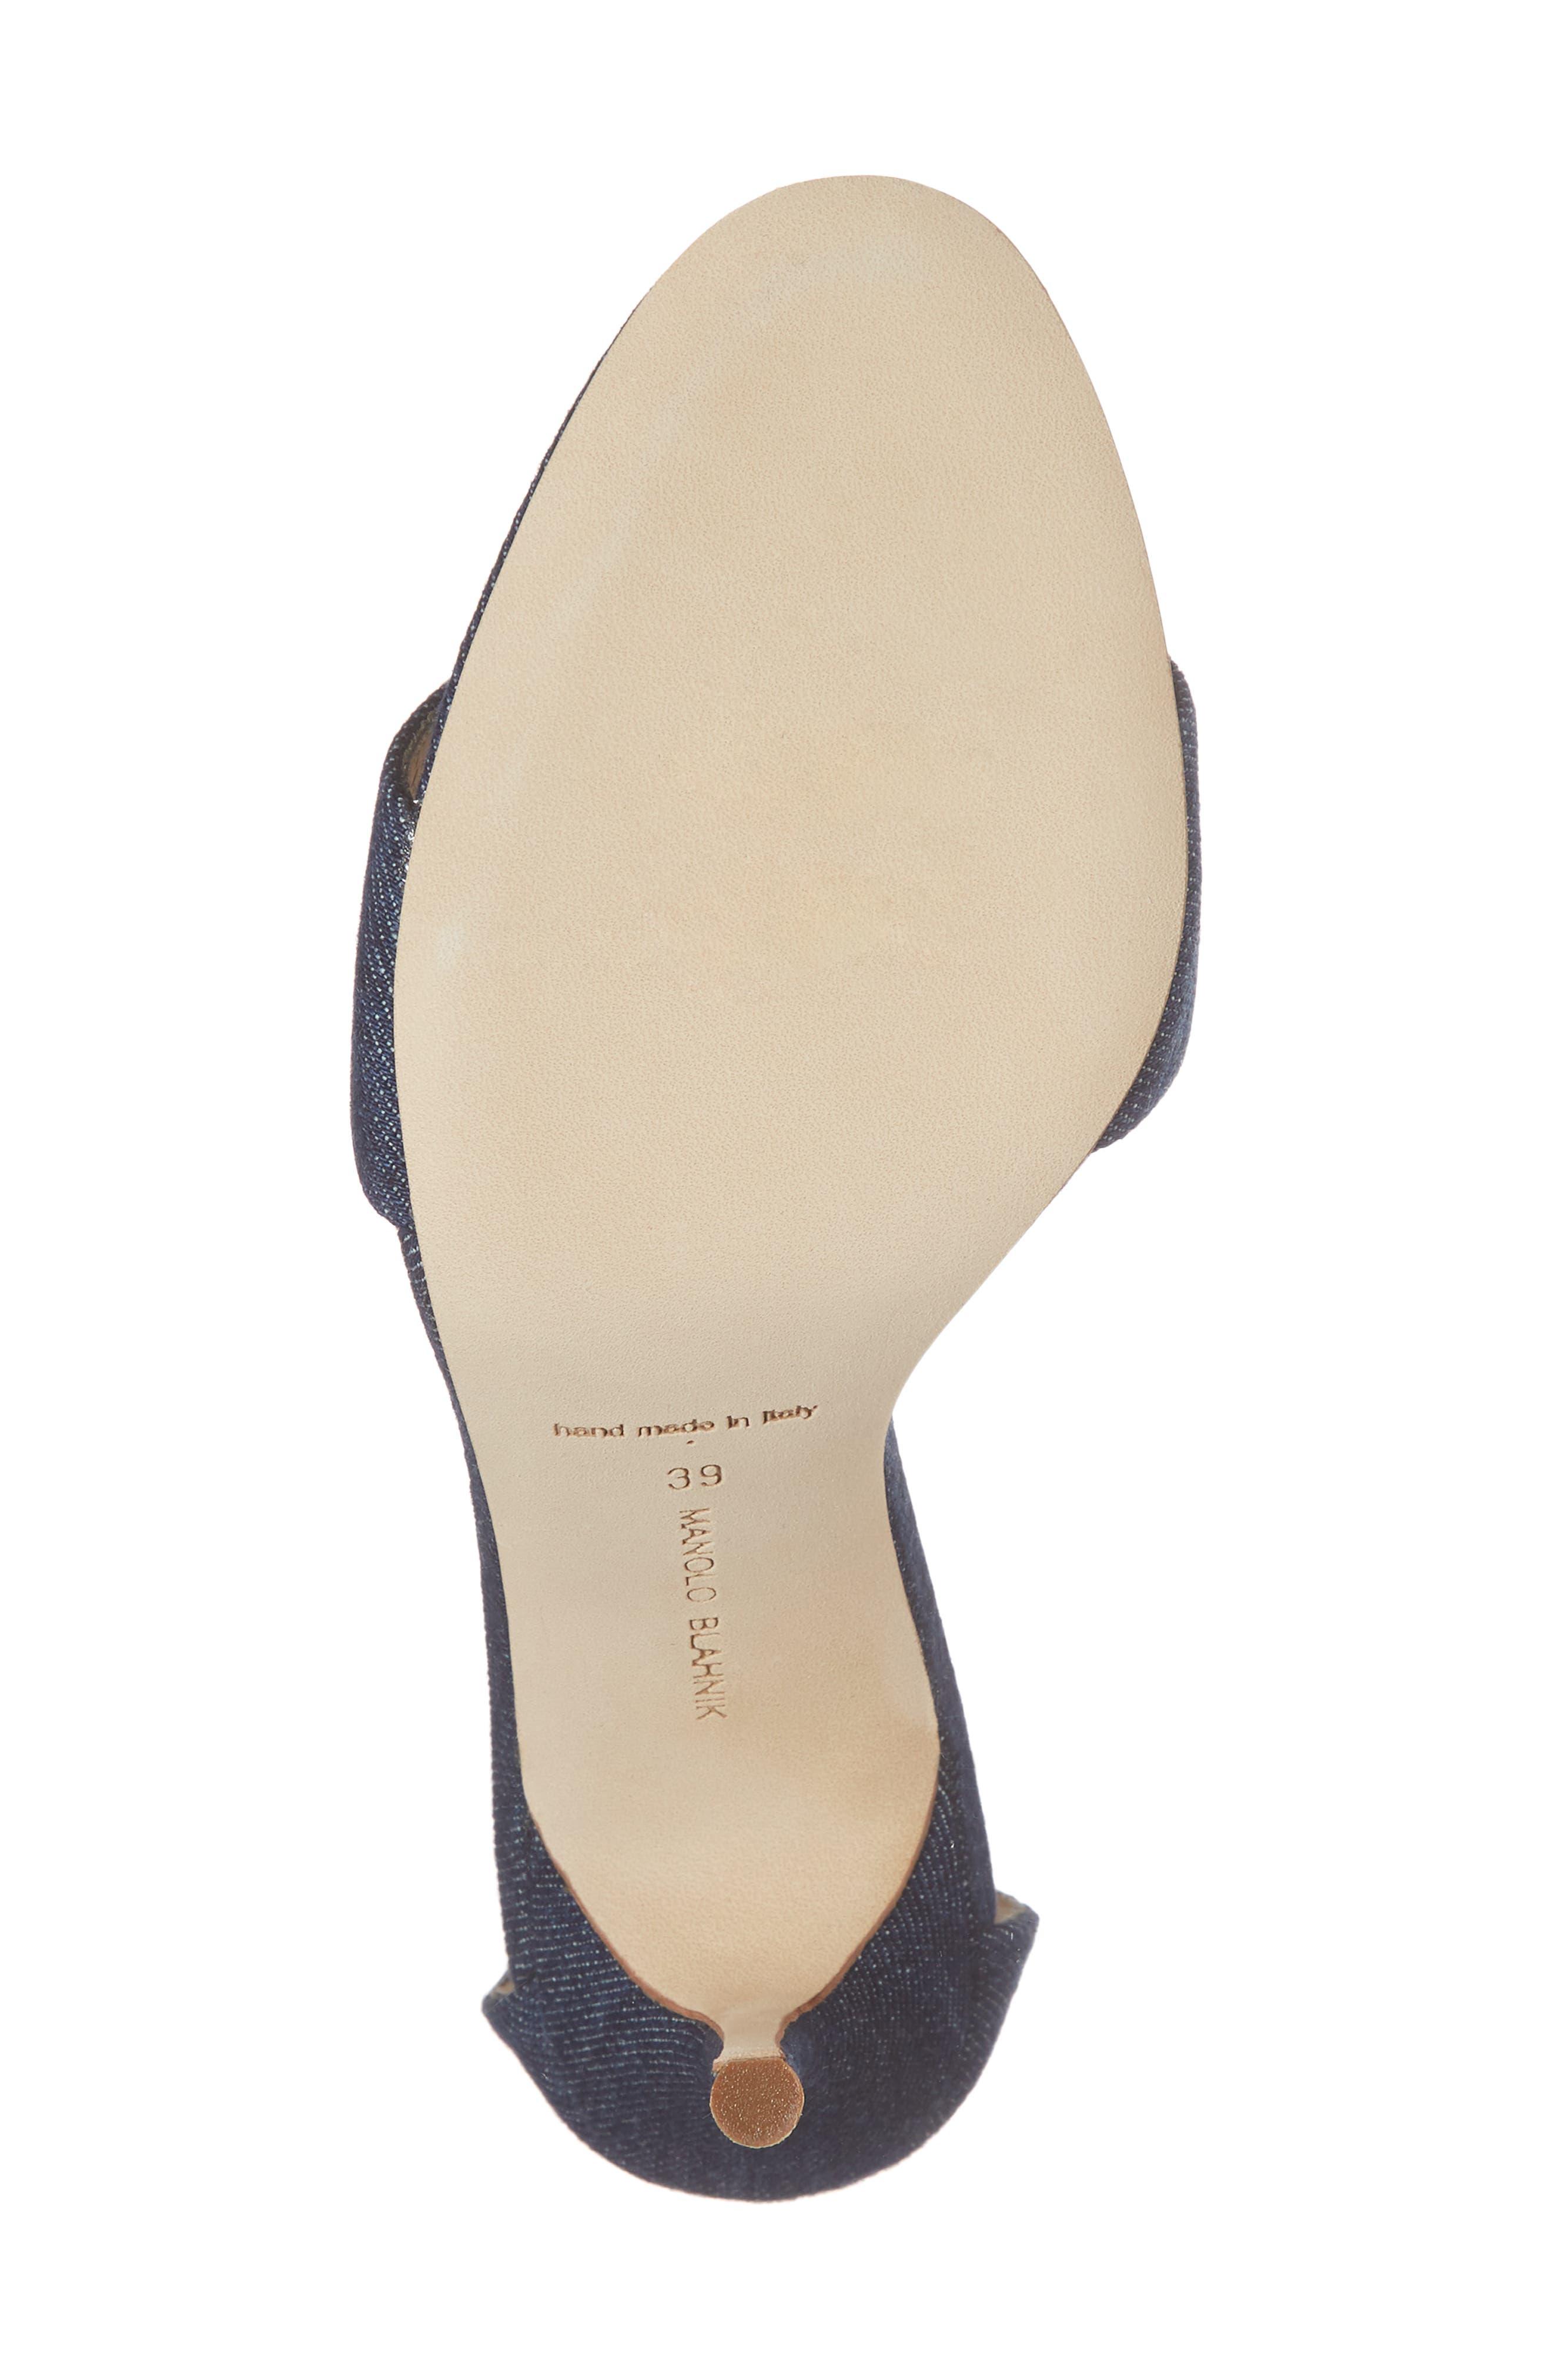 Tres Ankle Strap Sandal,                             Alternate thumbnail 6, color,                             DENIM BLUE